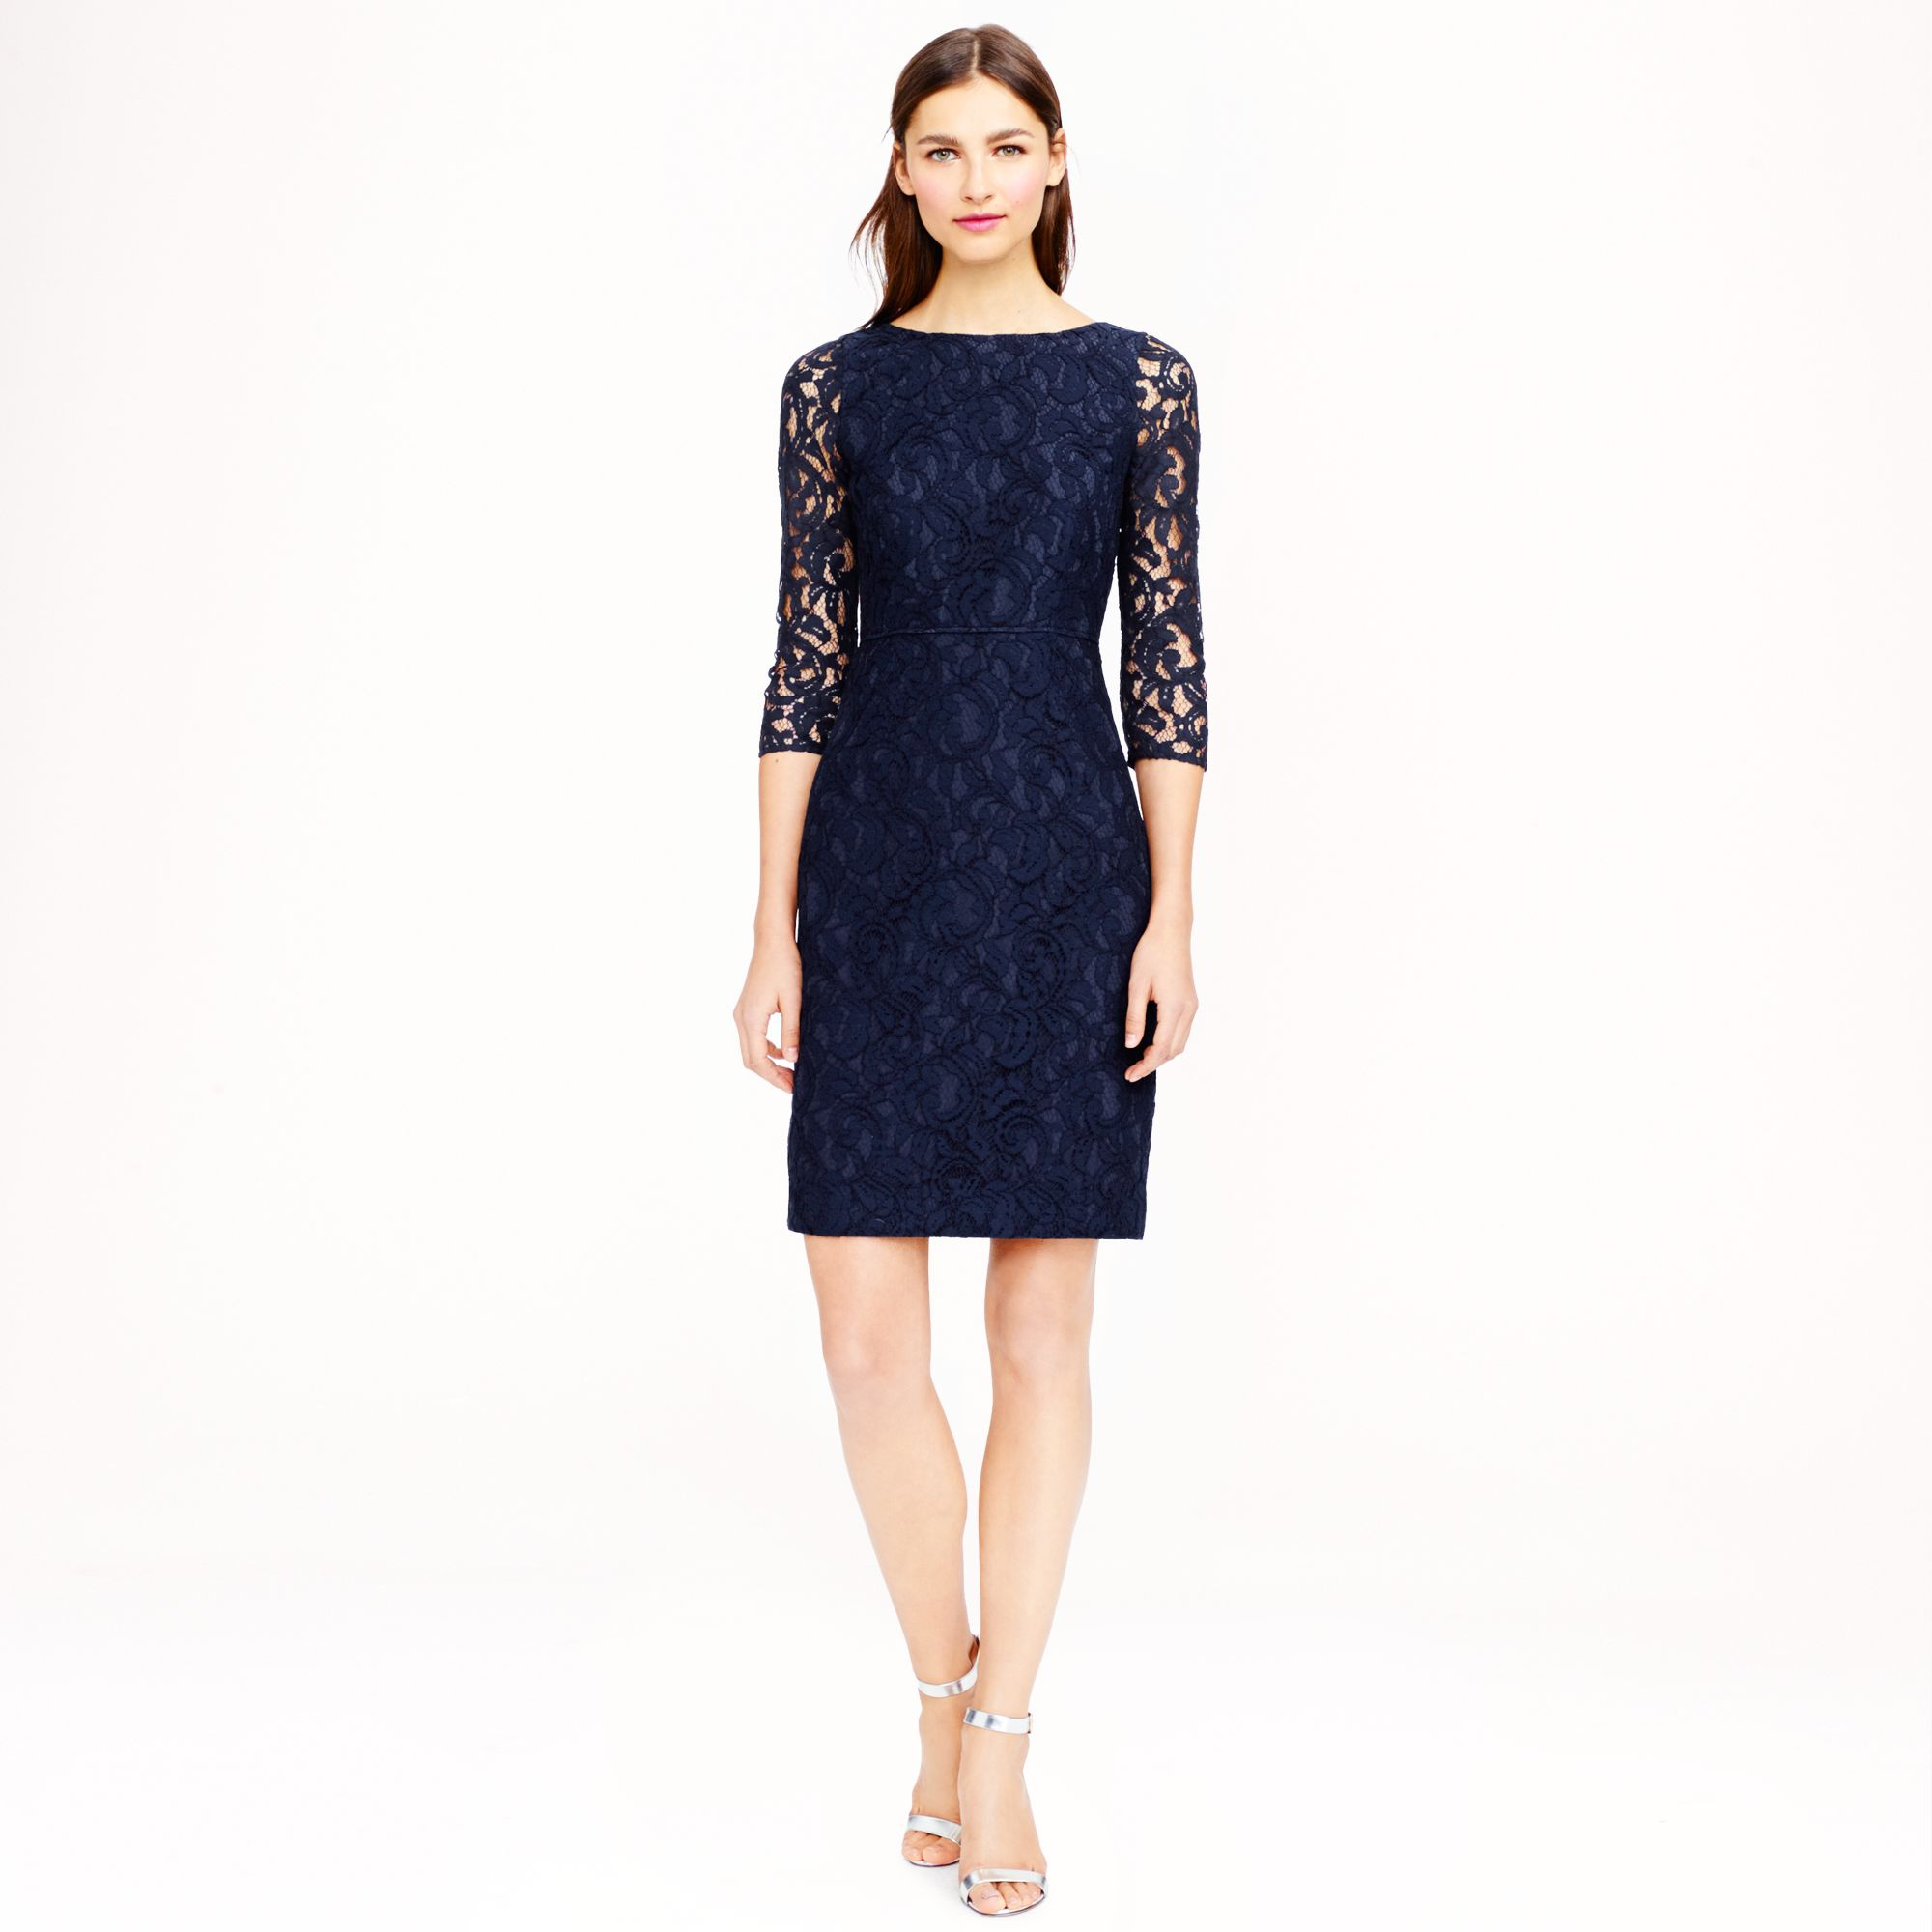 Petite natalia dress in leavers lace in blue navy for Jcrew com